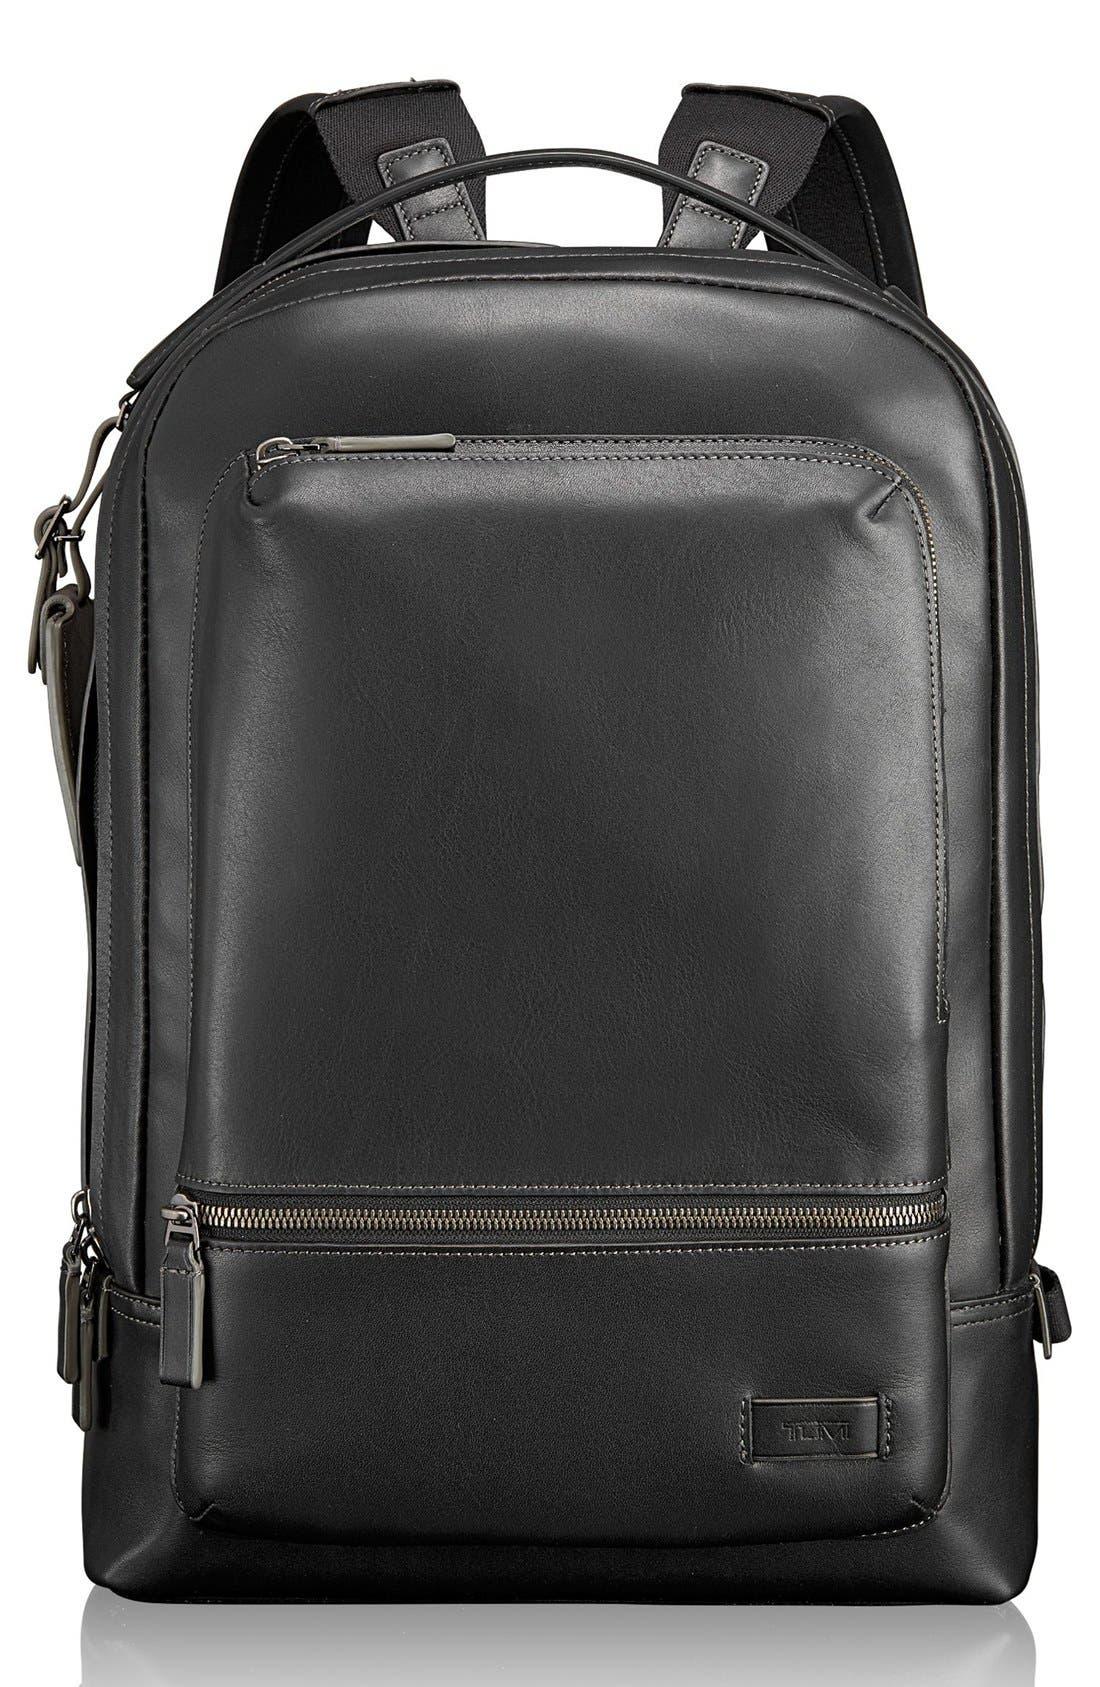 Tumi 'Harrison - Bates' Leather Backpack